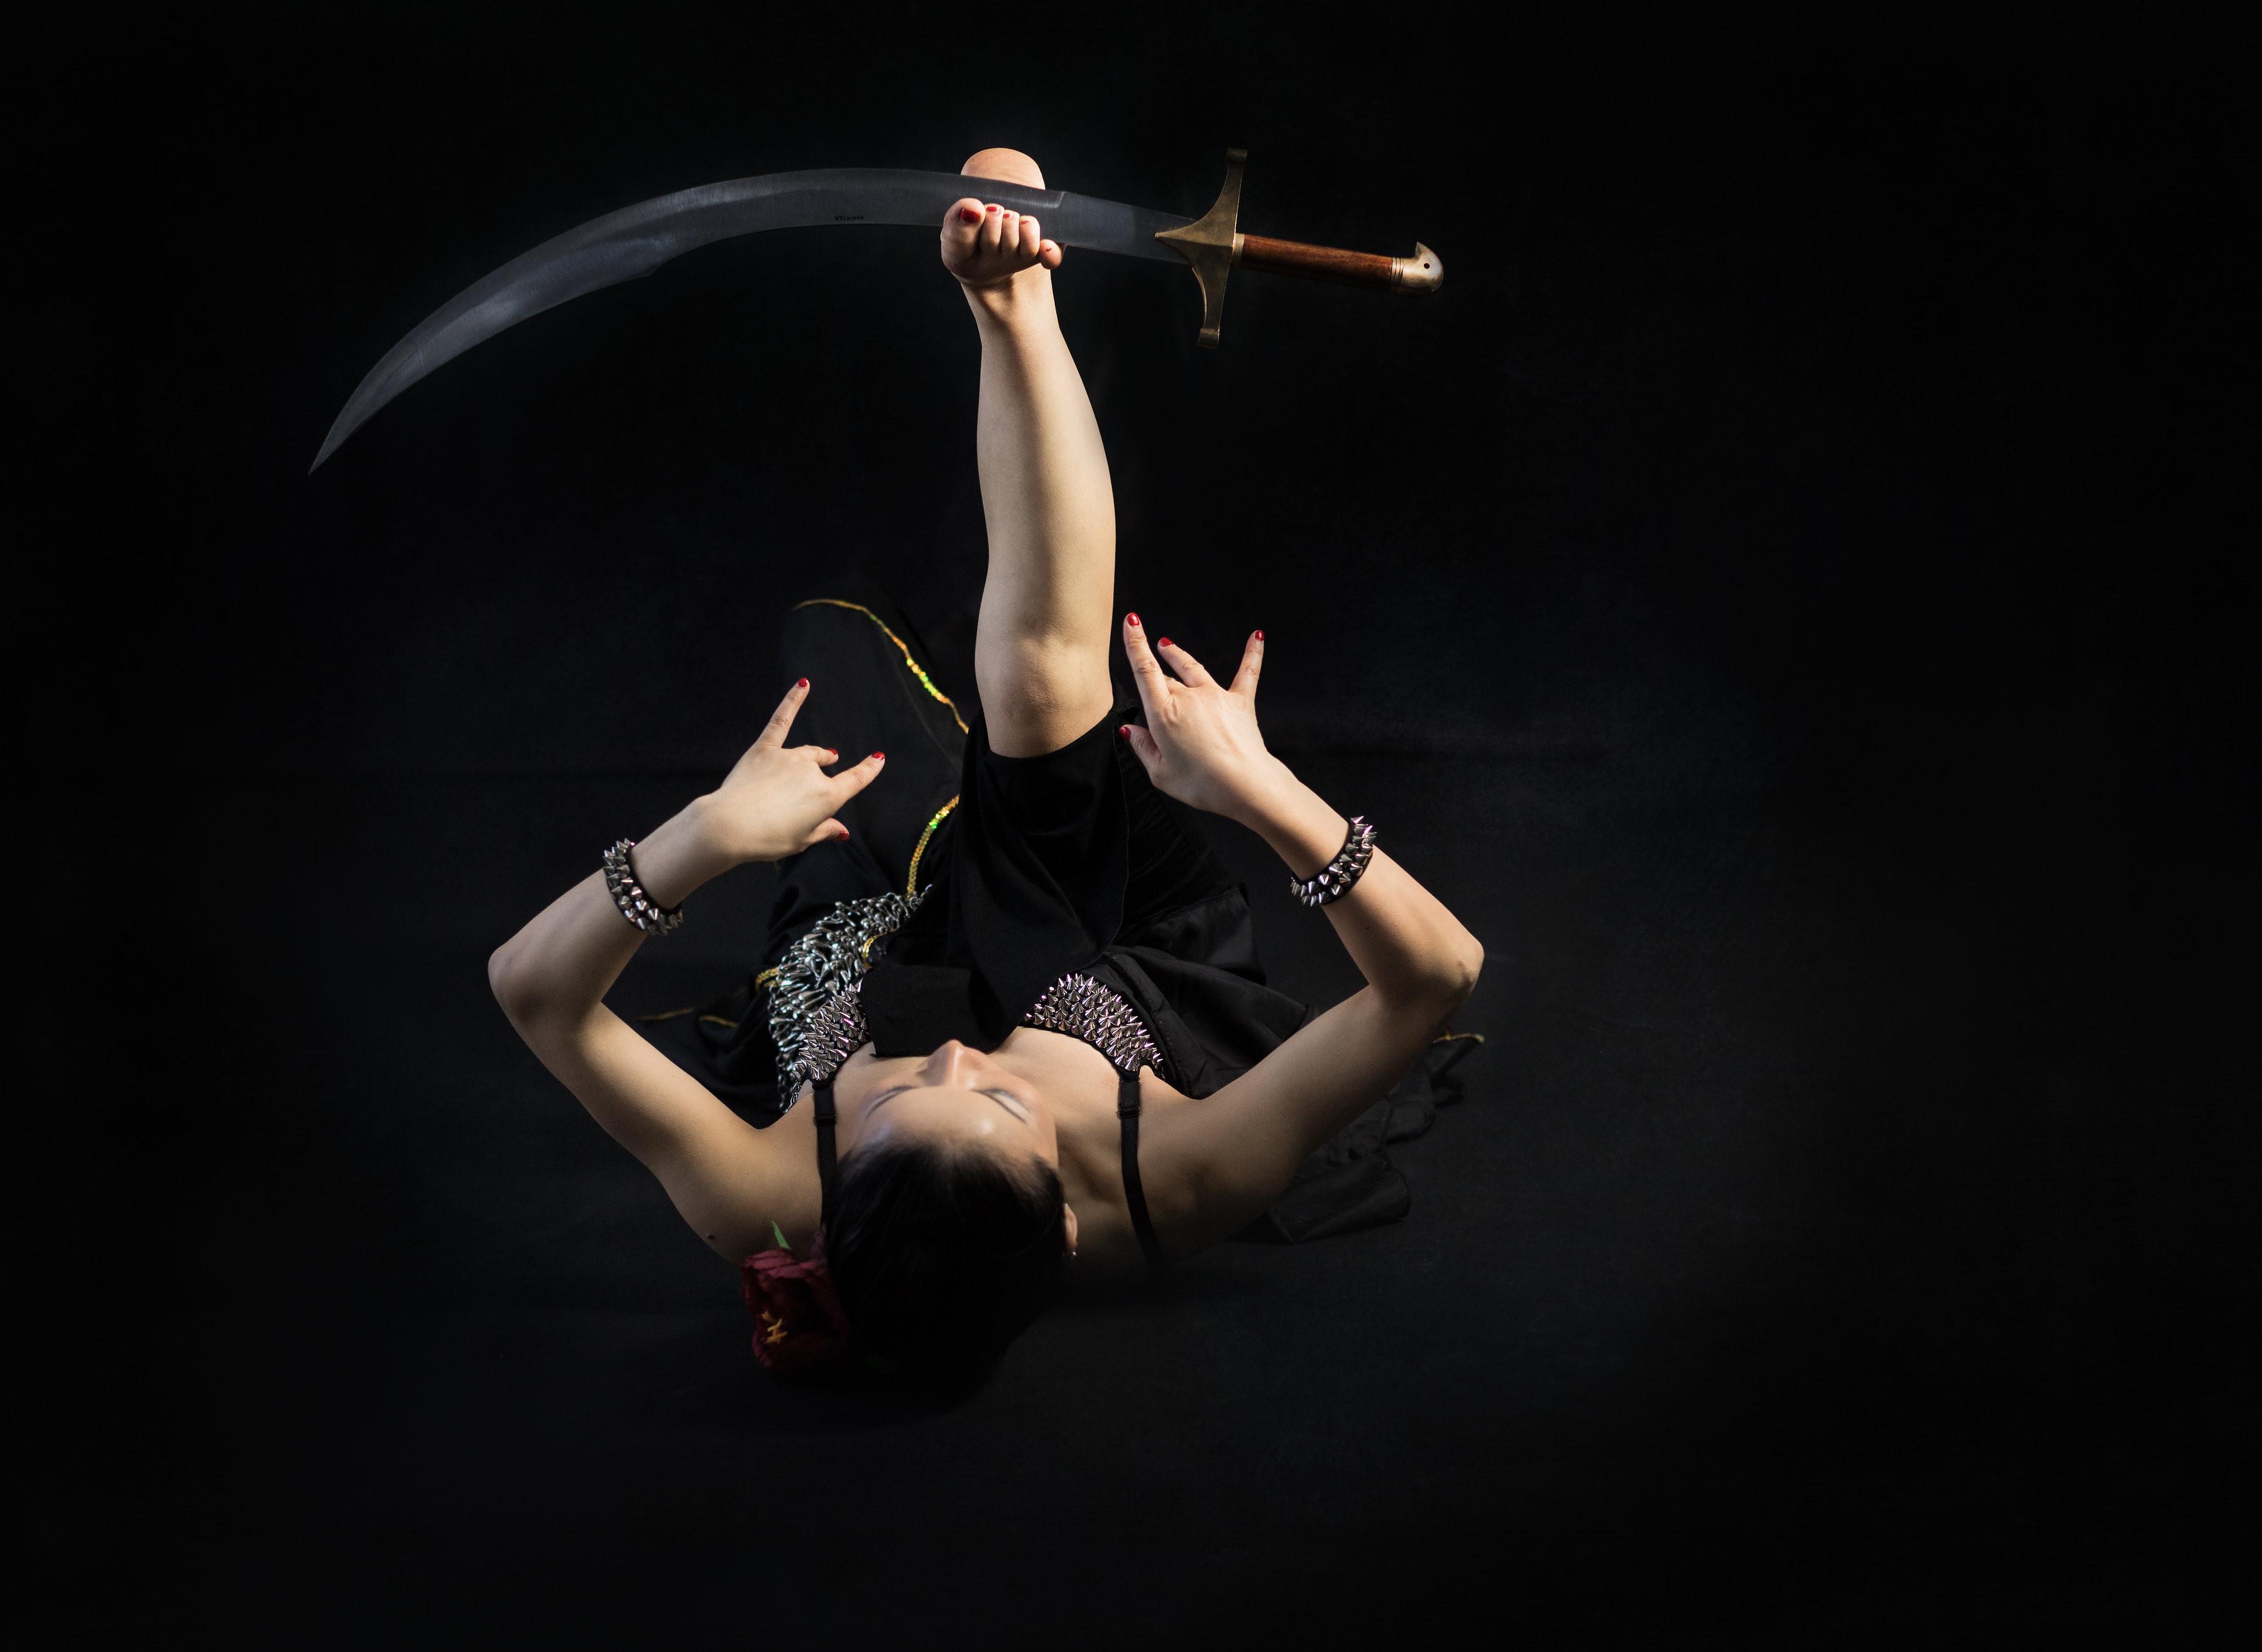 10 minutes Sword dance performance